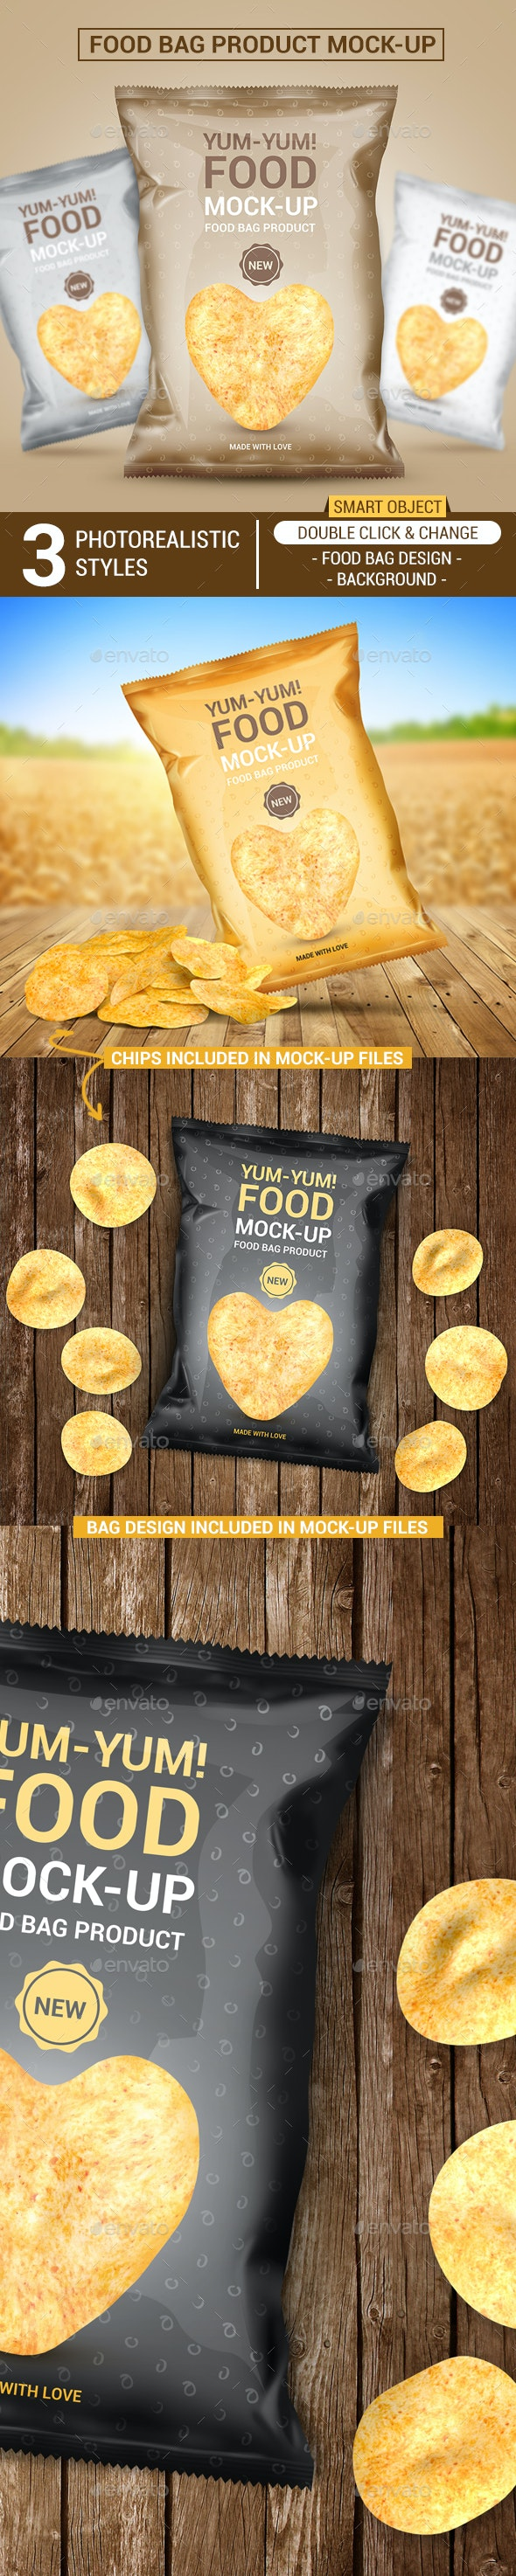 Food Bag Product Mock-Ups - Food and Drink Packaging